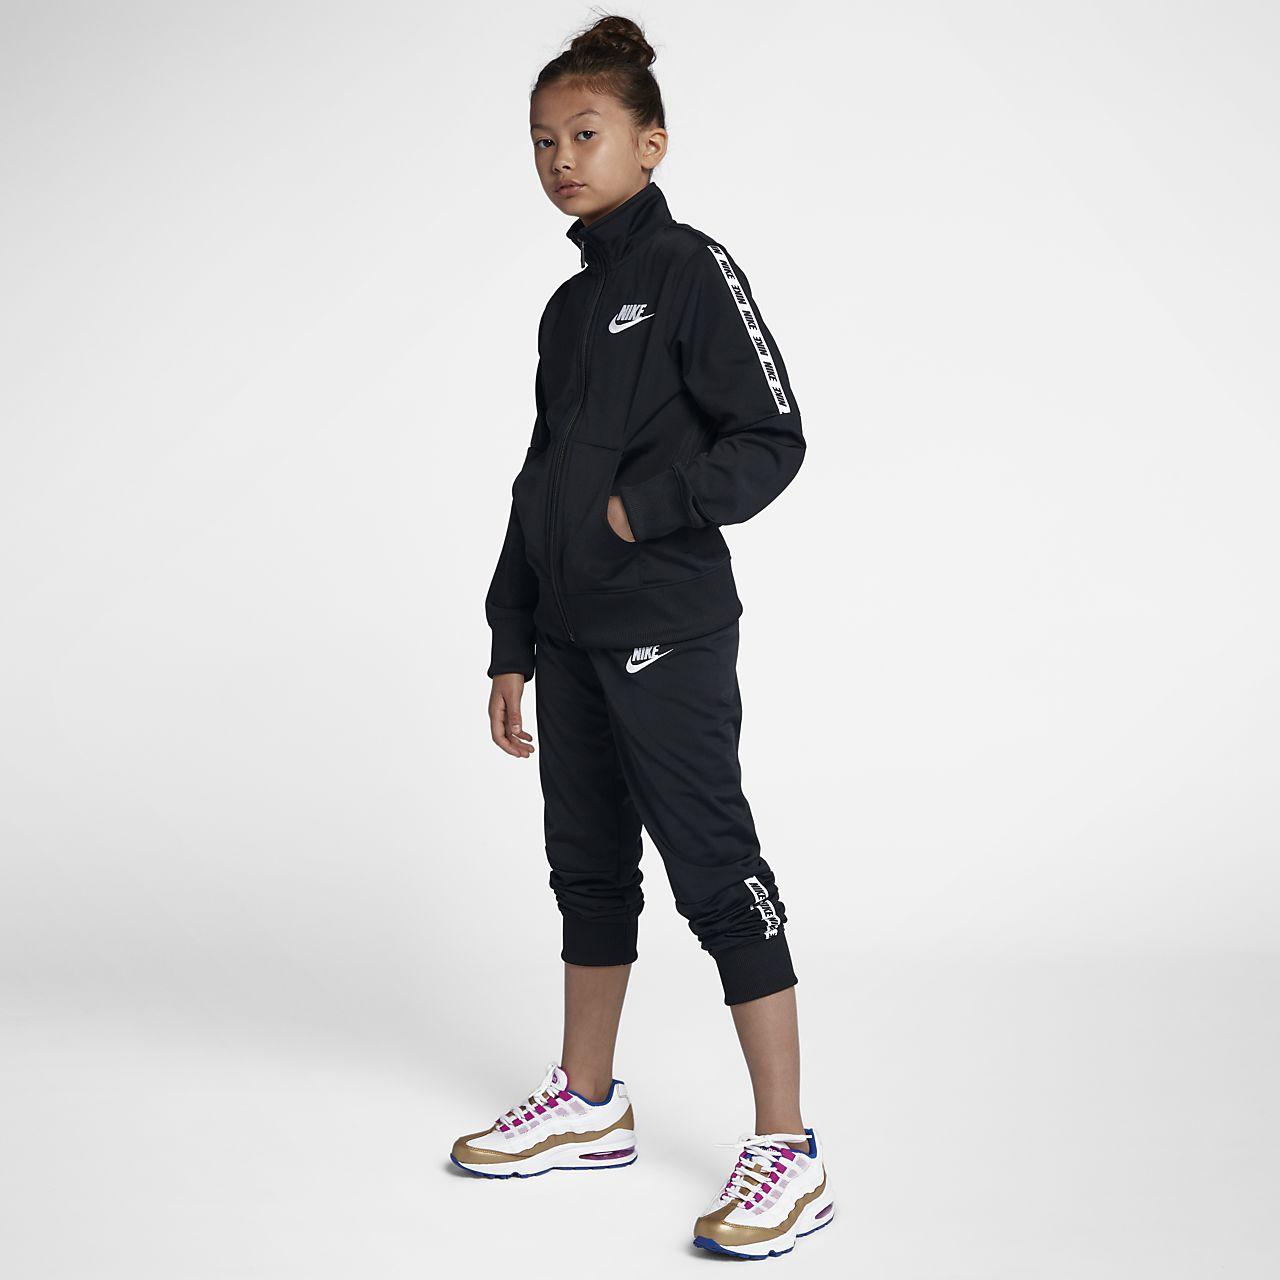 df87a8e274f9b Survêtement Nike Sportswear pour Fille plus âgée. Nike.com CA